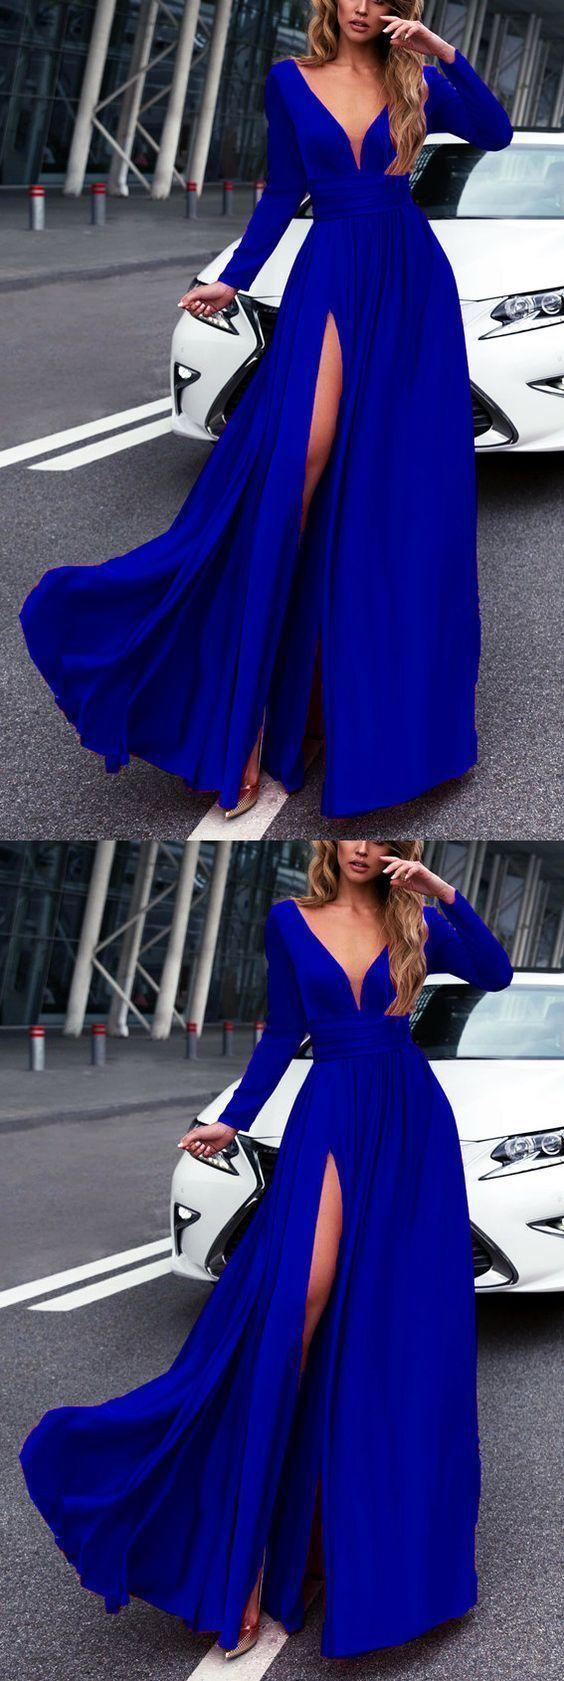 Royal blue long sleeves prom dresses leg split evening gowns in